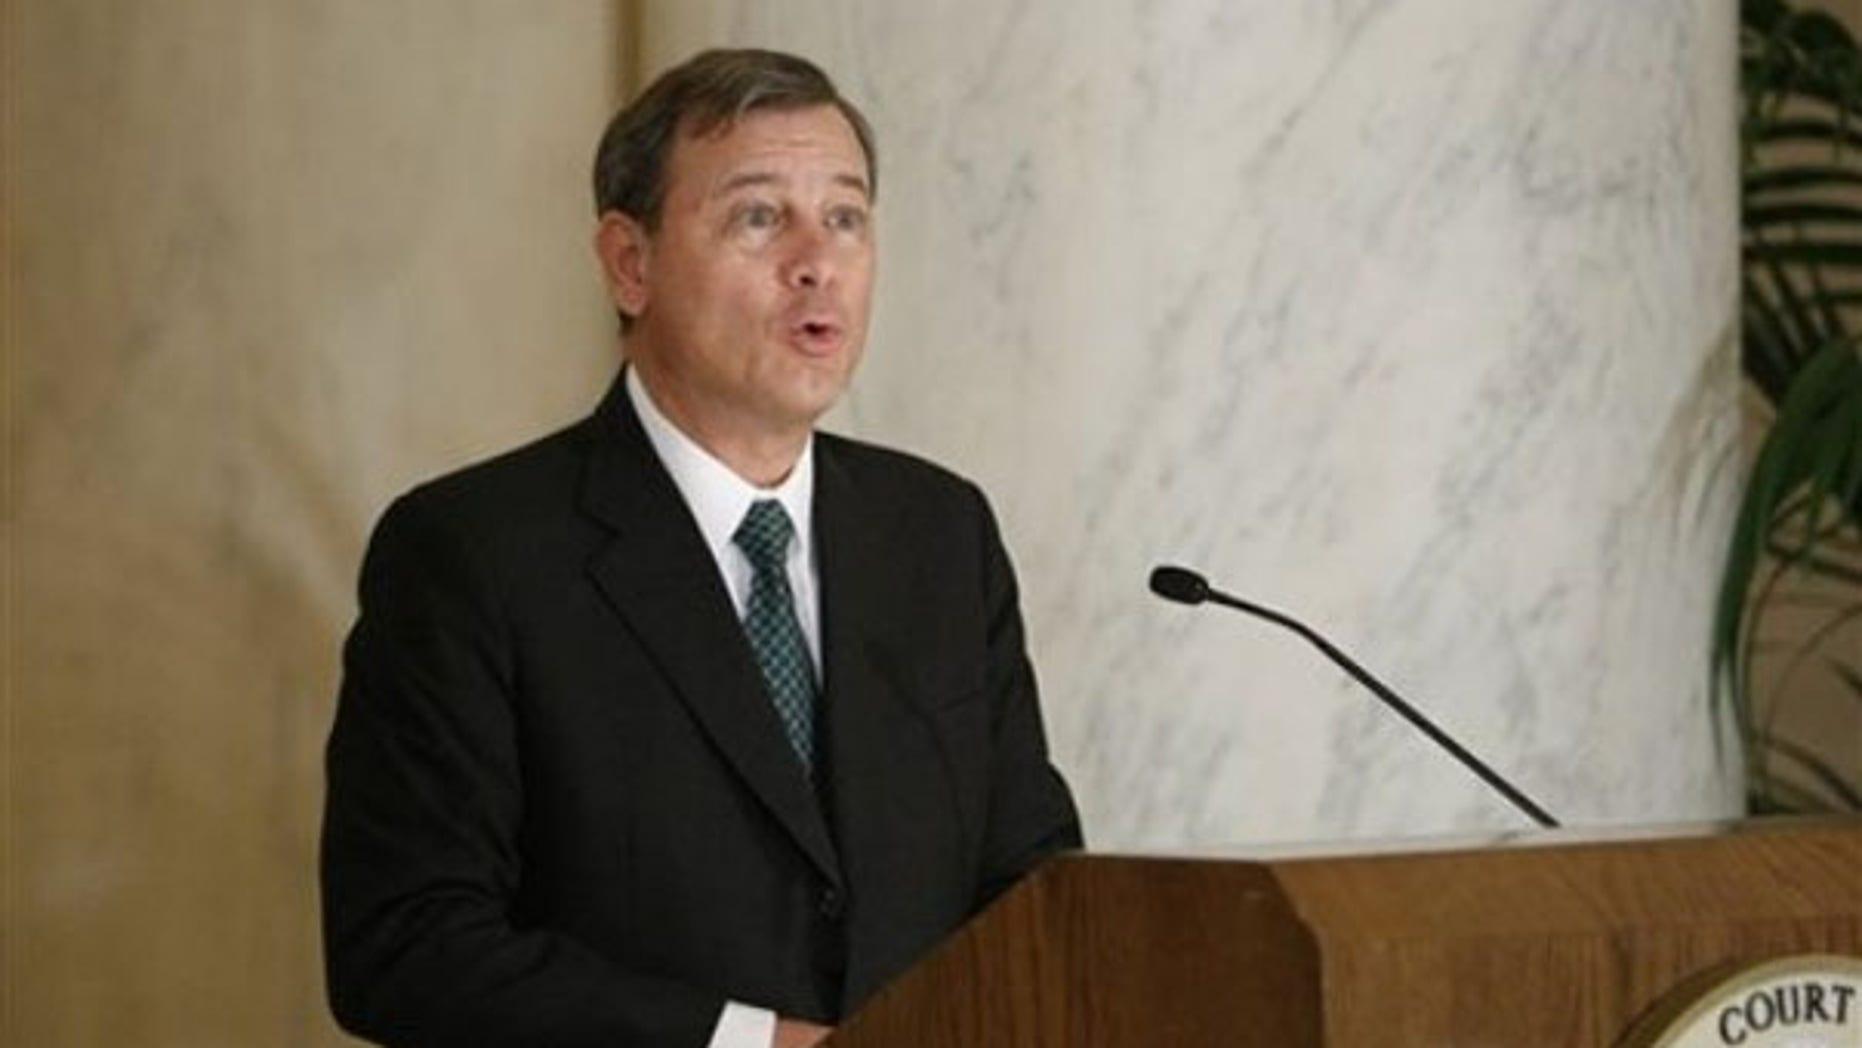 FILE: Chief Justice John Roberts (AP Photo)